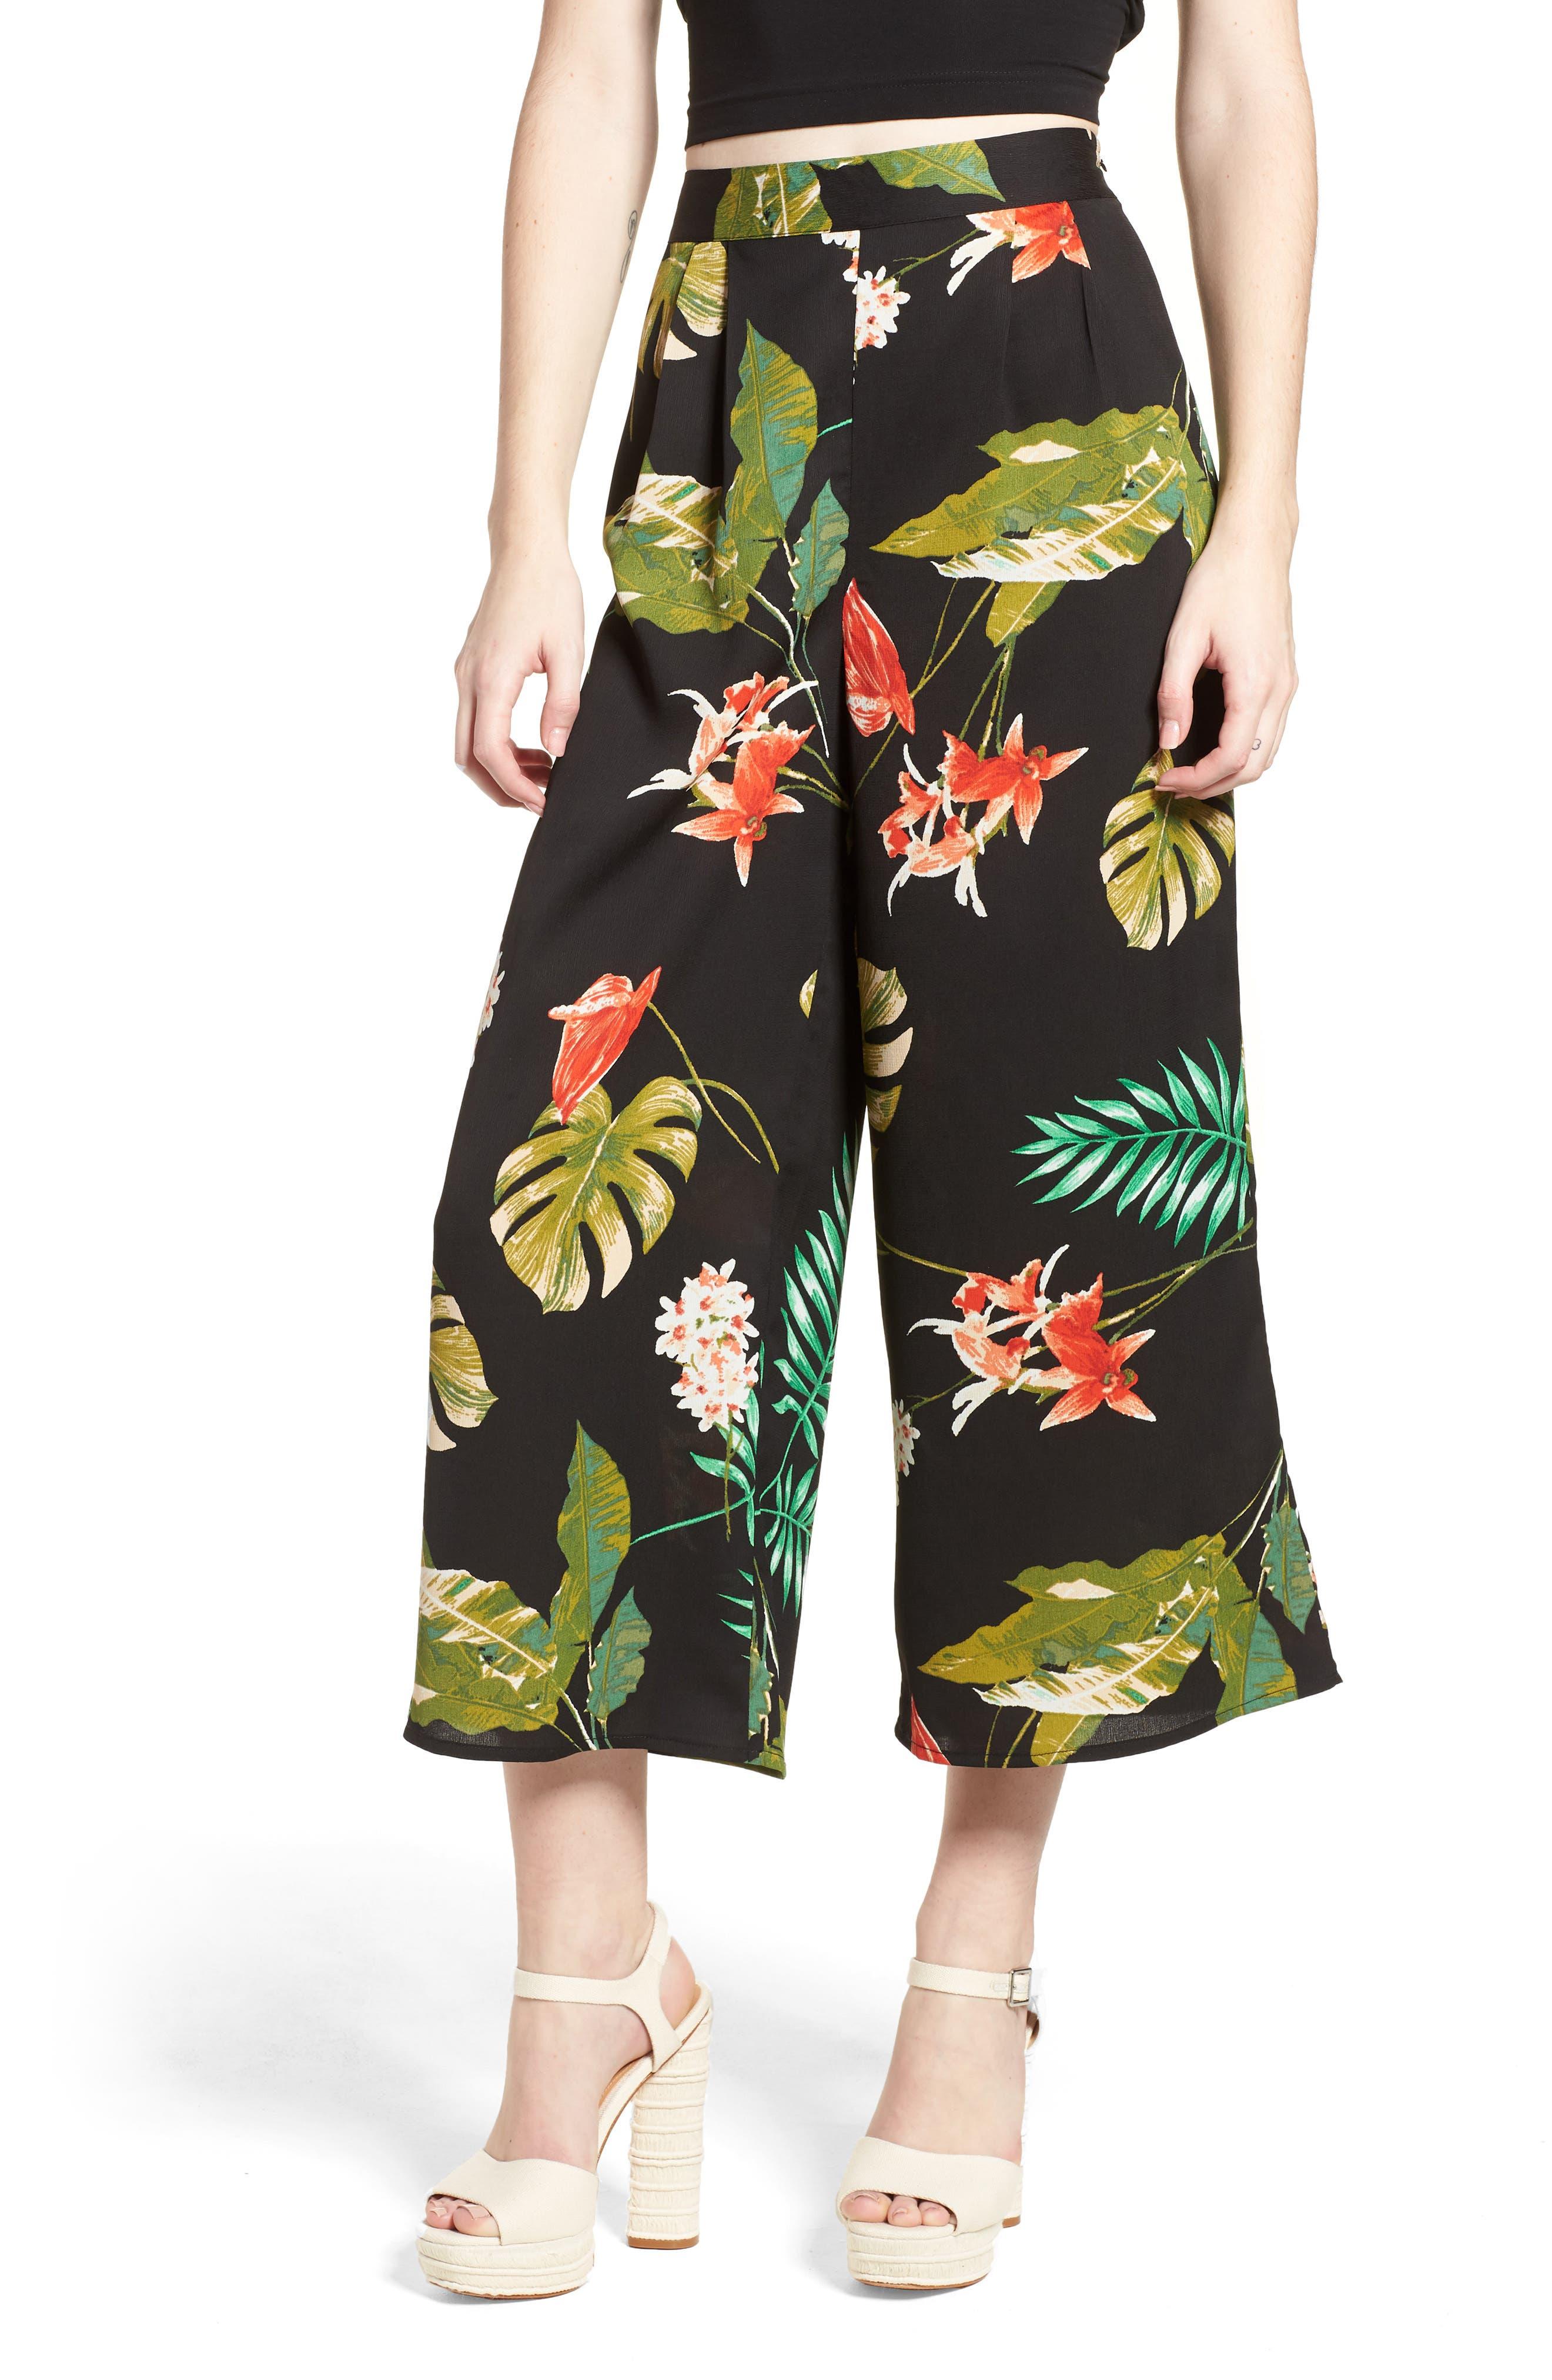 LYDELLE Tropical Print Culottes, Main, color, 001